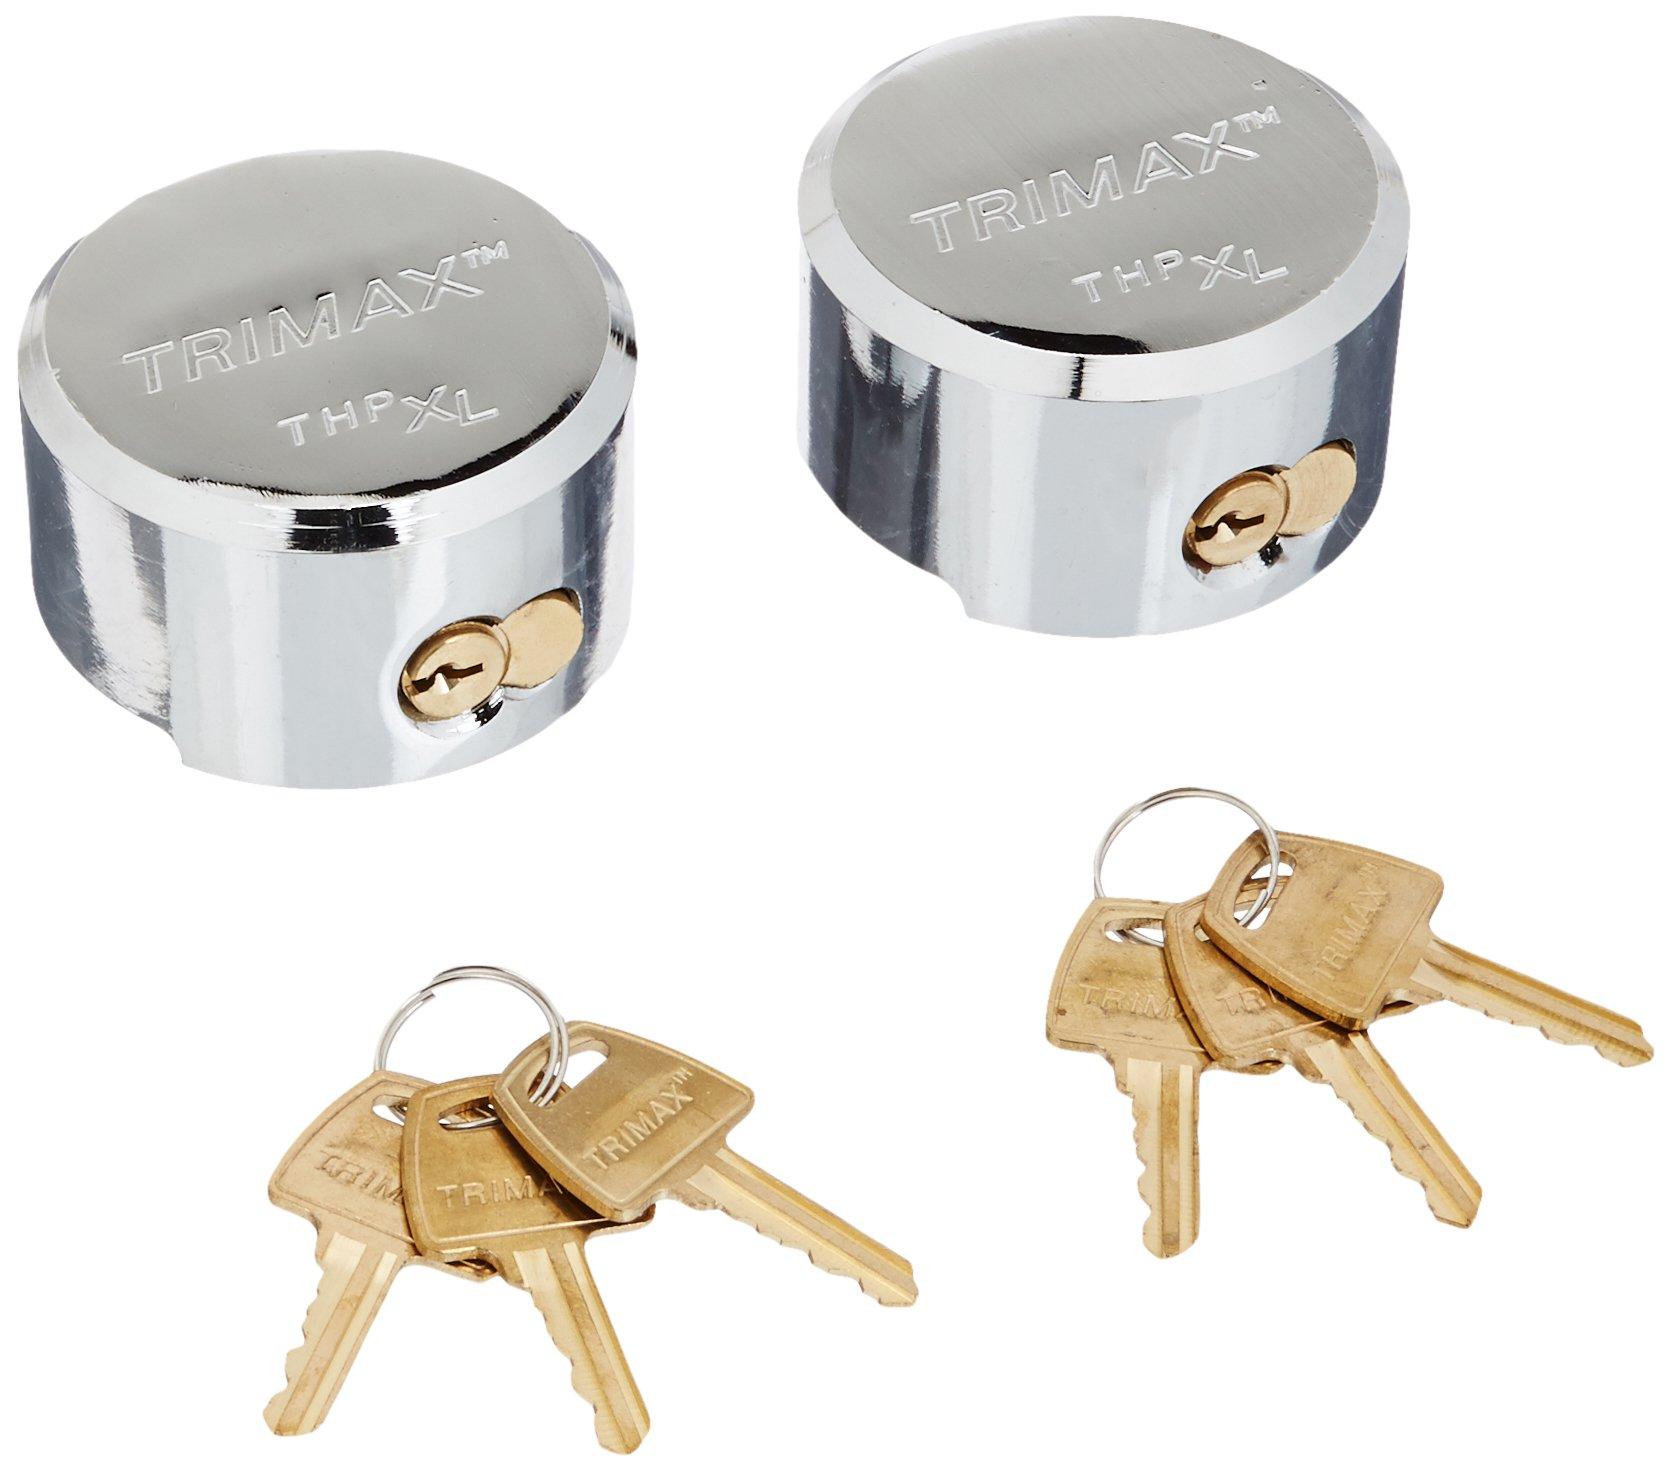 Trimax THP2XL Keyed Alike Trailer Door Lock, (Pack of 2) by Trimax